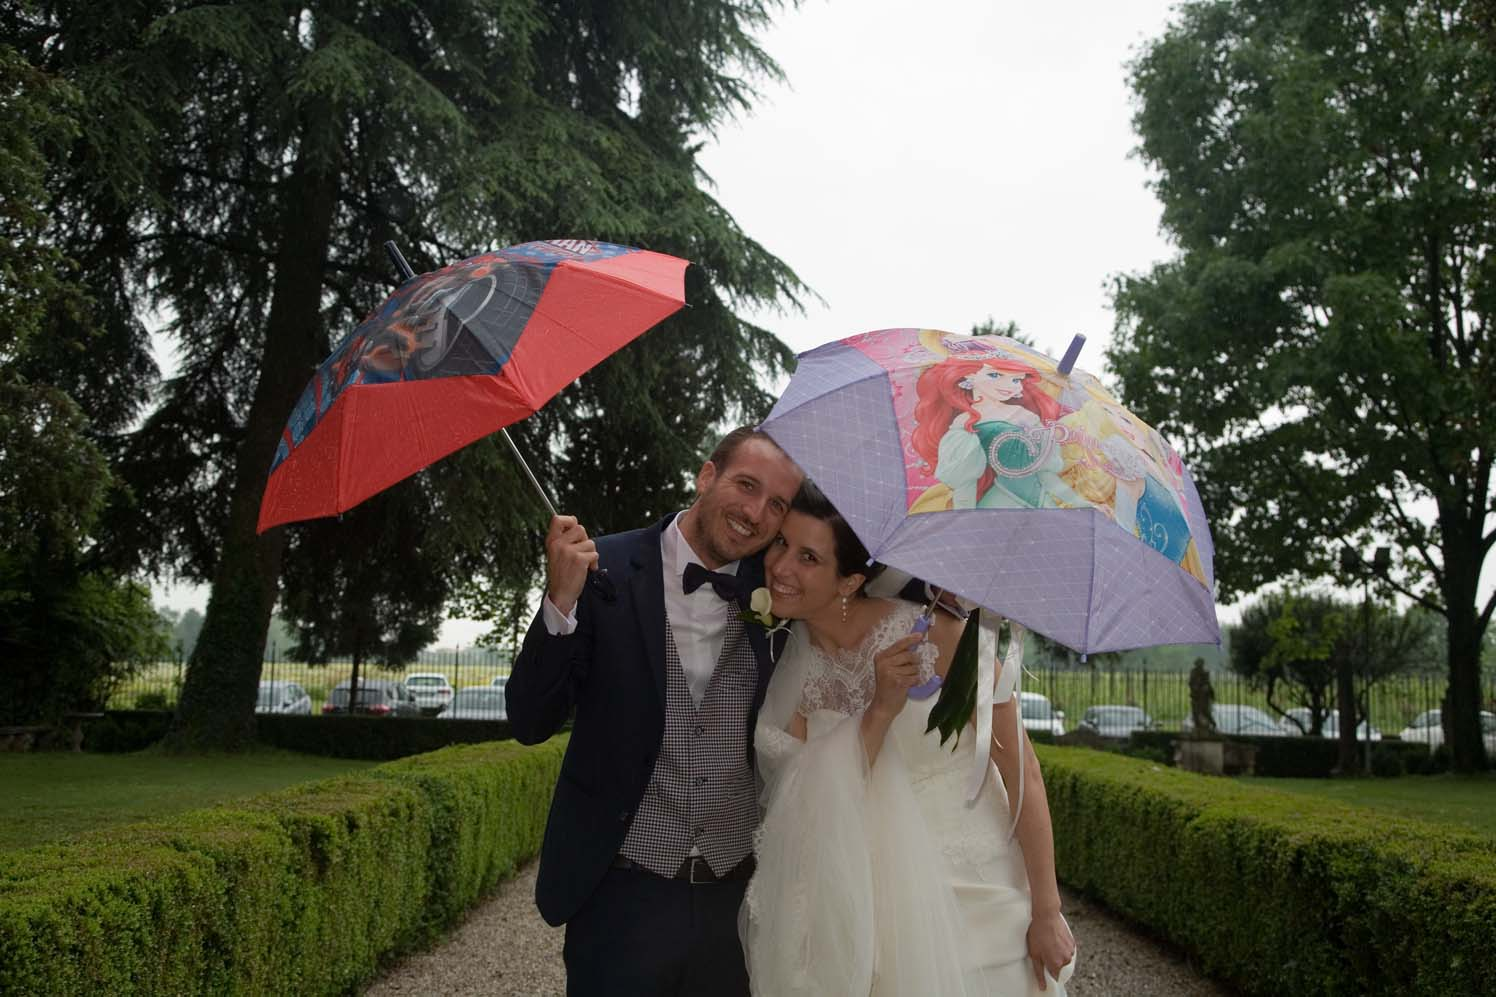 Silvia Sposa Fleur de Lys - Atelier abiti da sposa (Treviso)